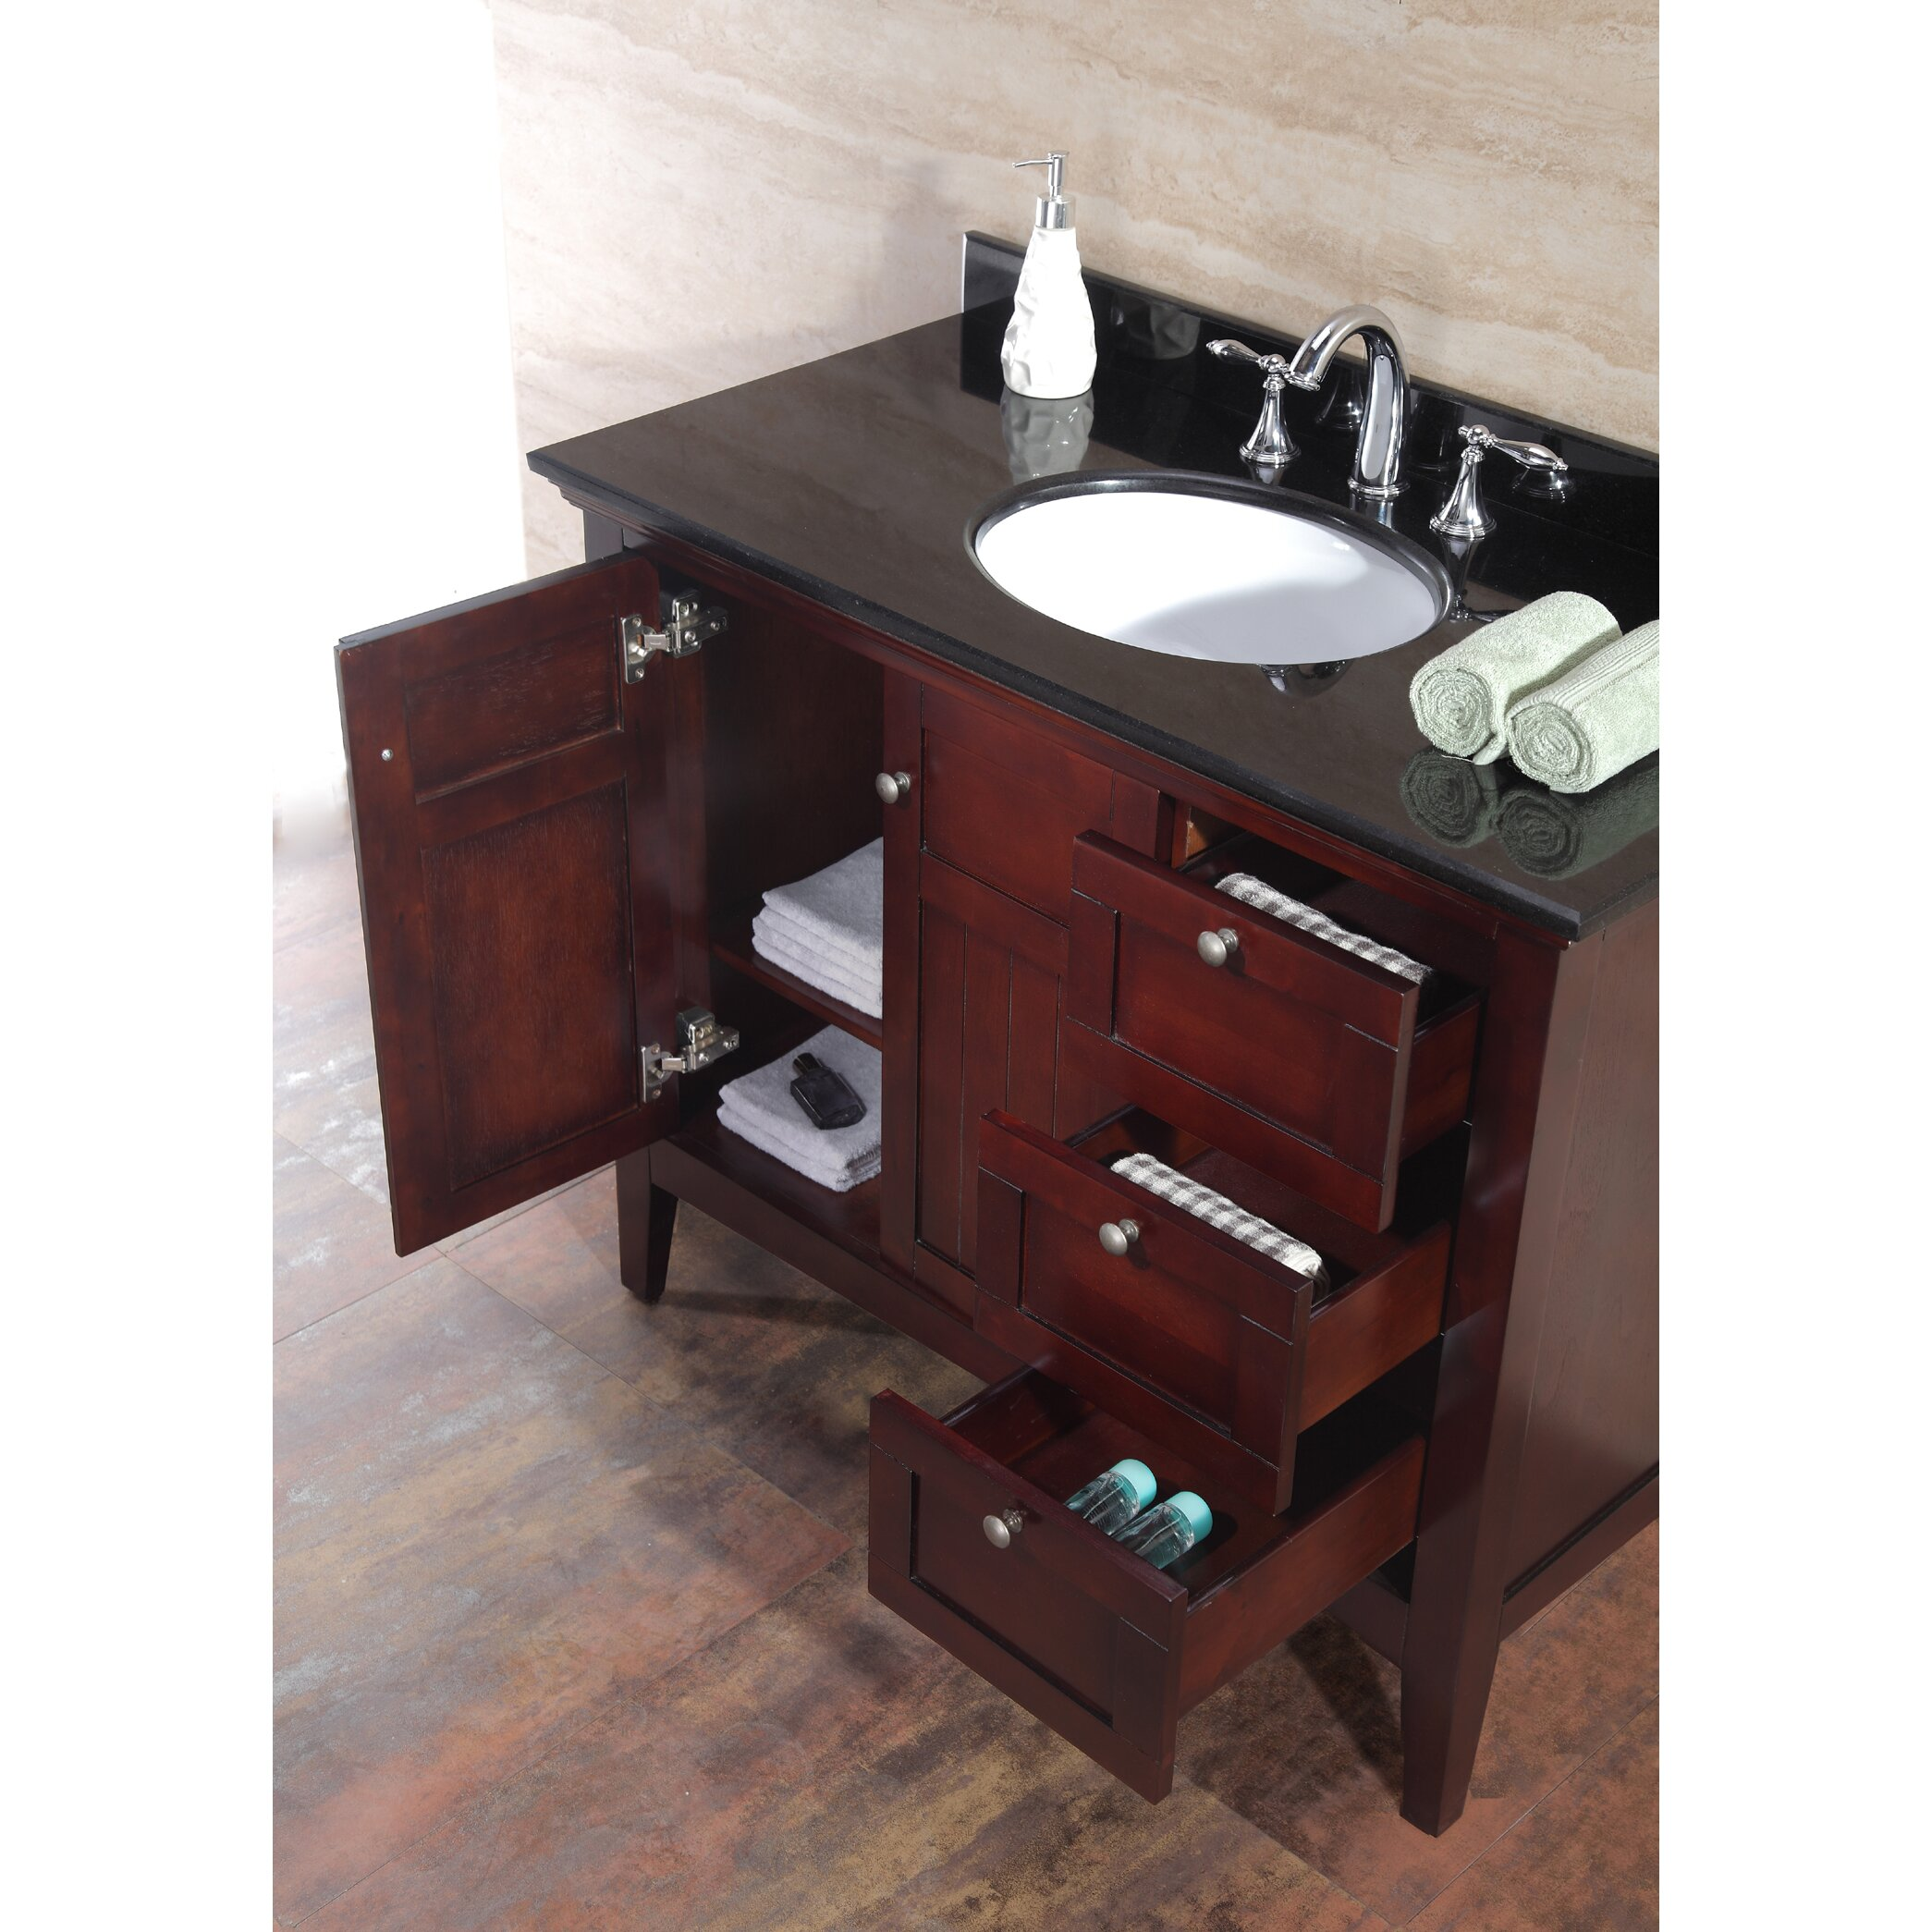 Ove decors gavin 42 single bathroom vanity set reviews for Decor vanity